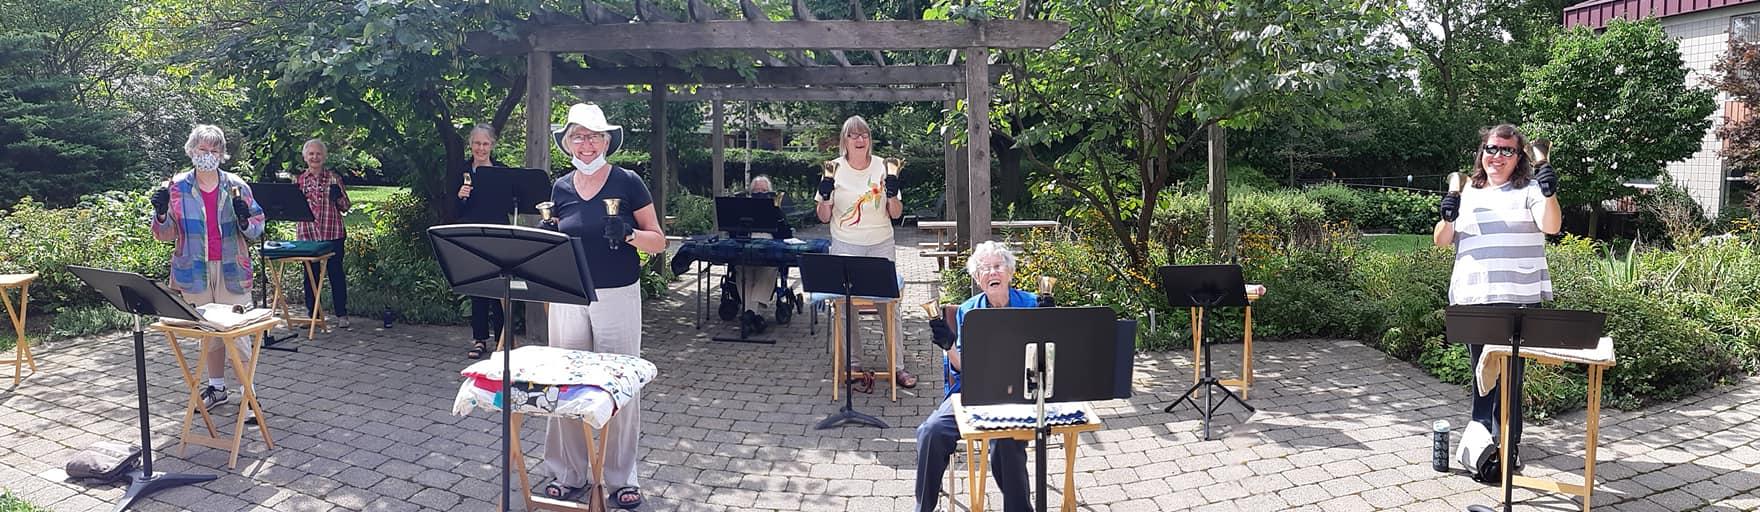 Handbell choir gathered in the Harcourt garden